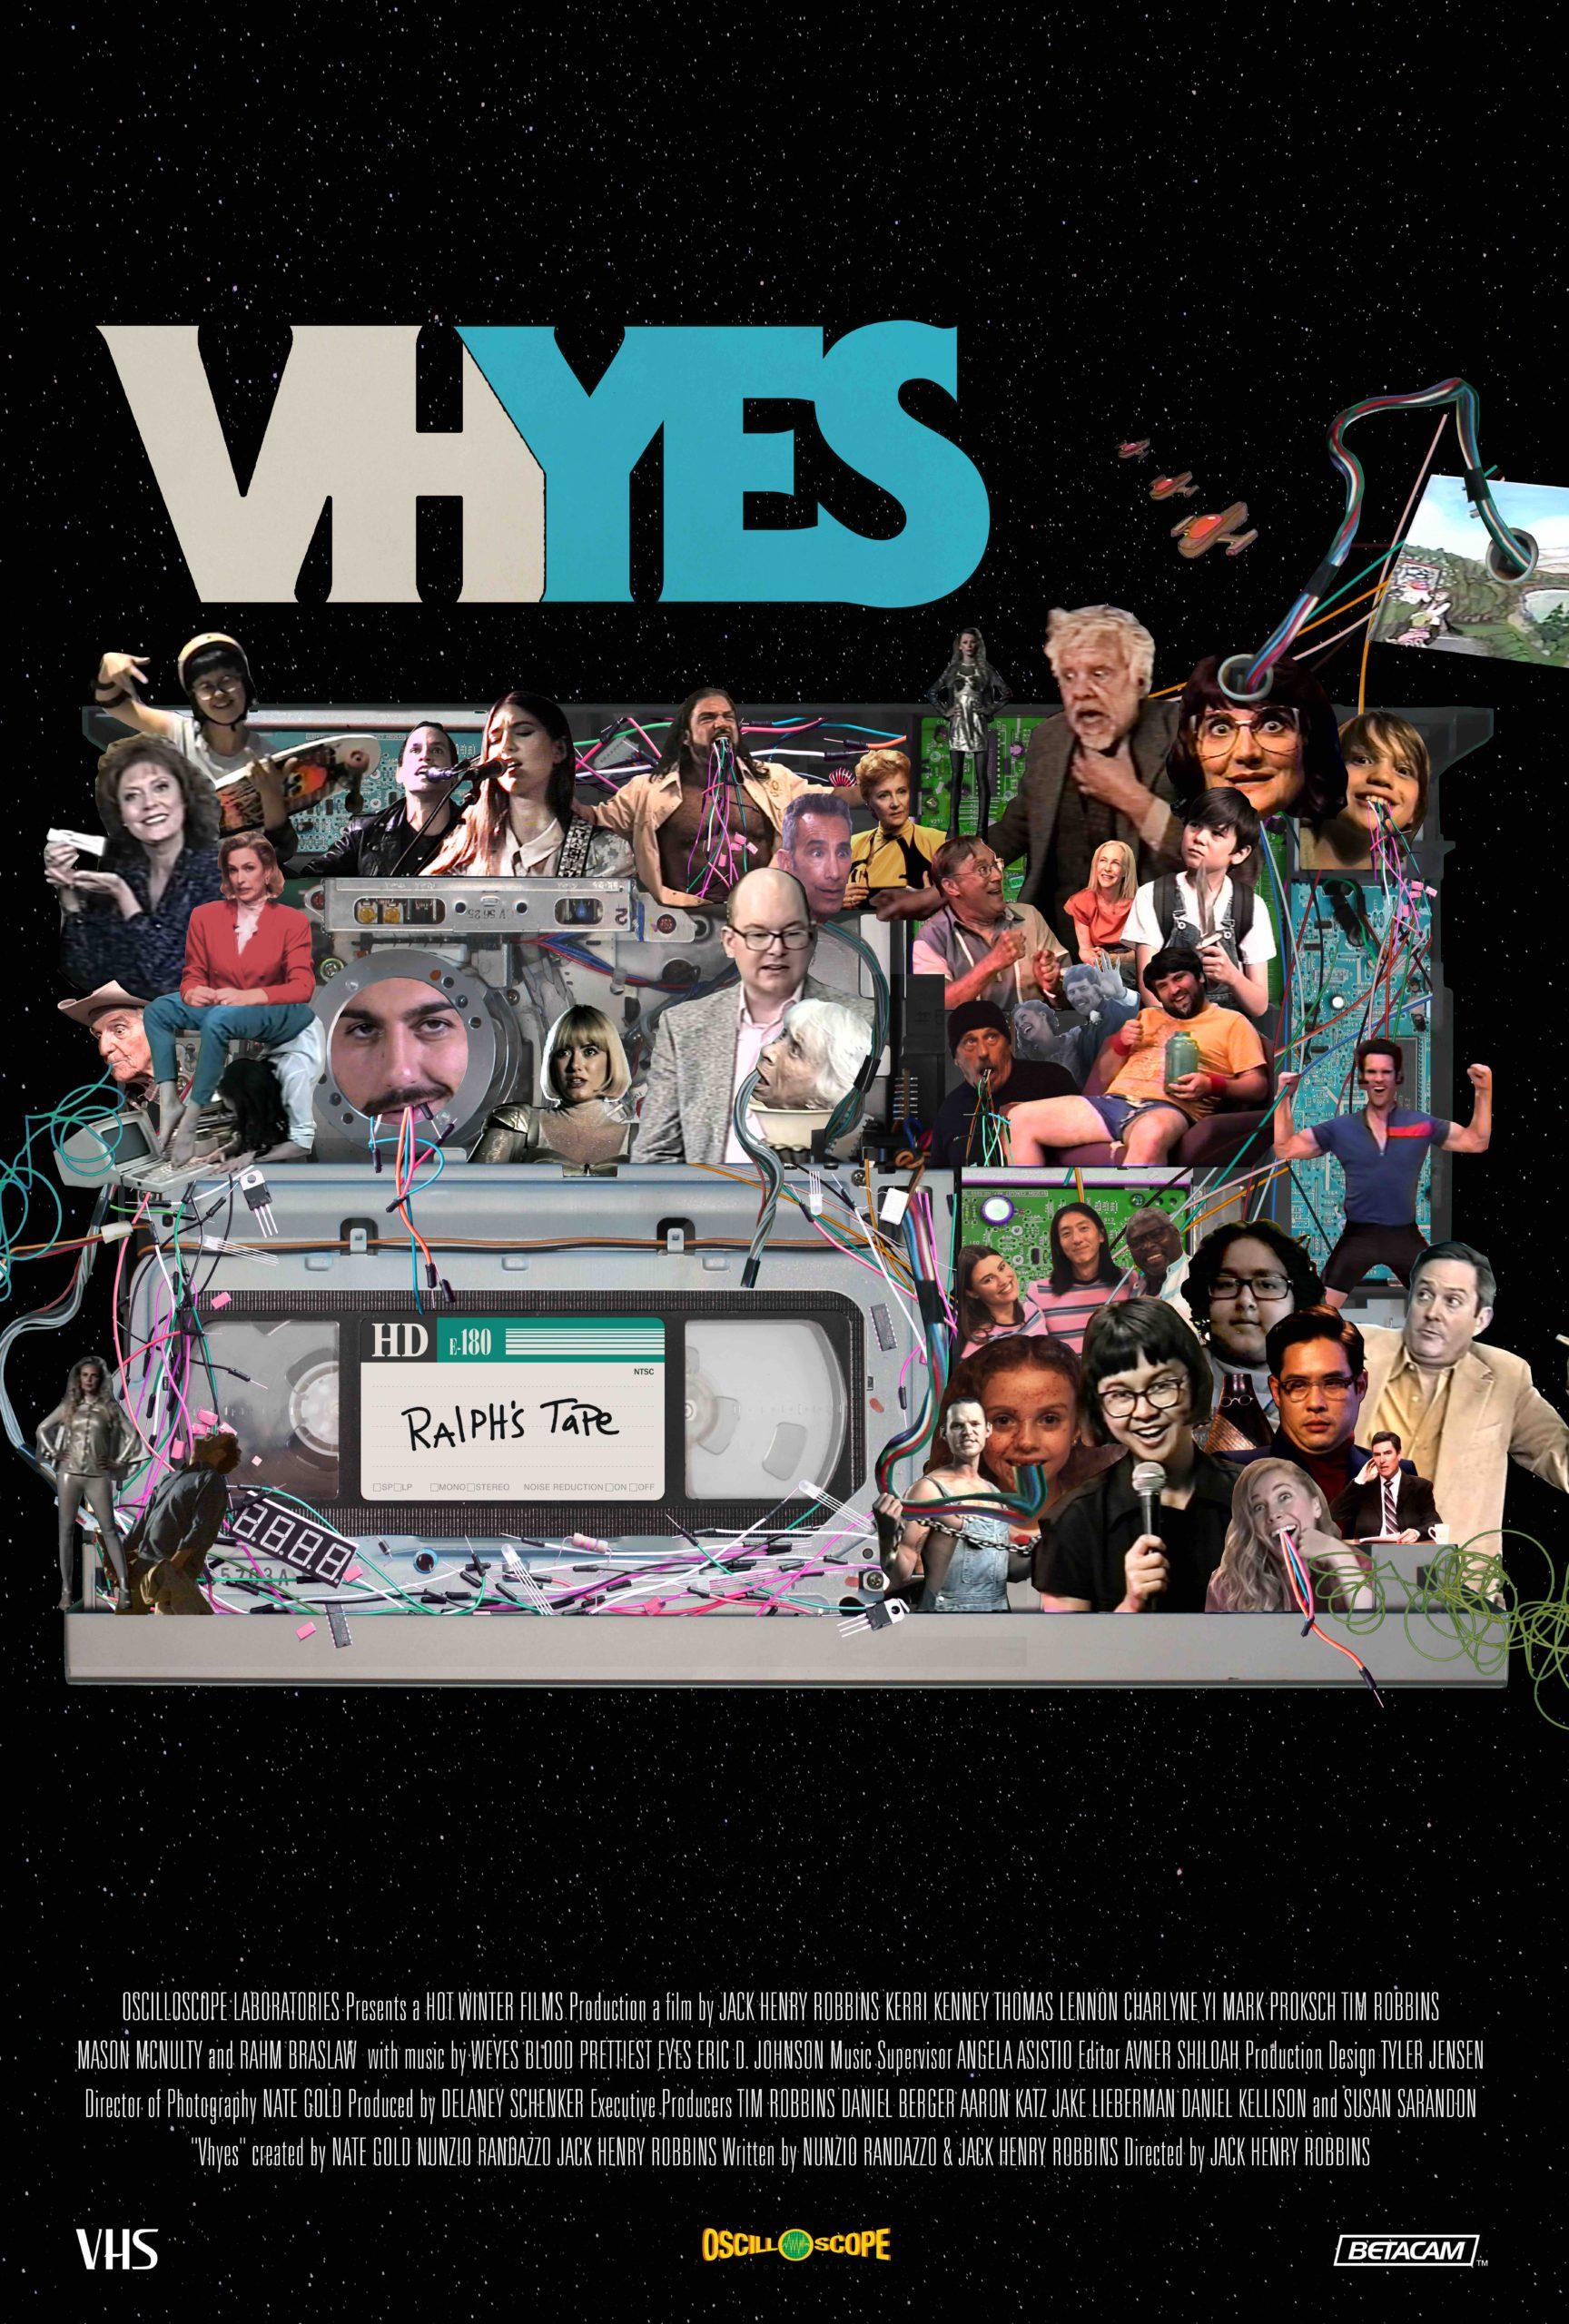 VHYes, Tim Robbins